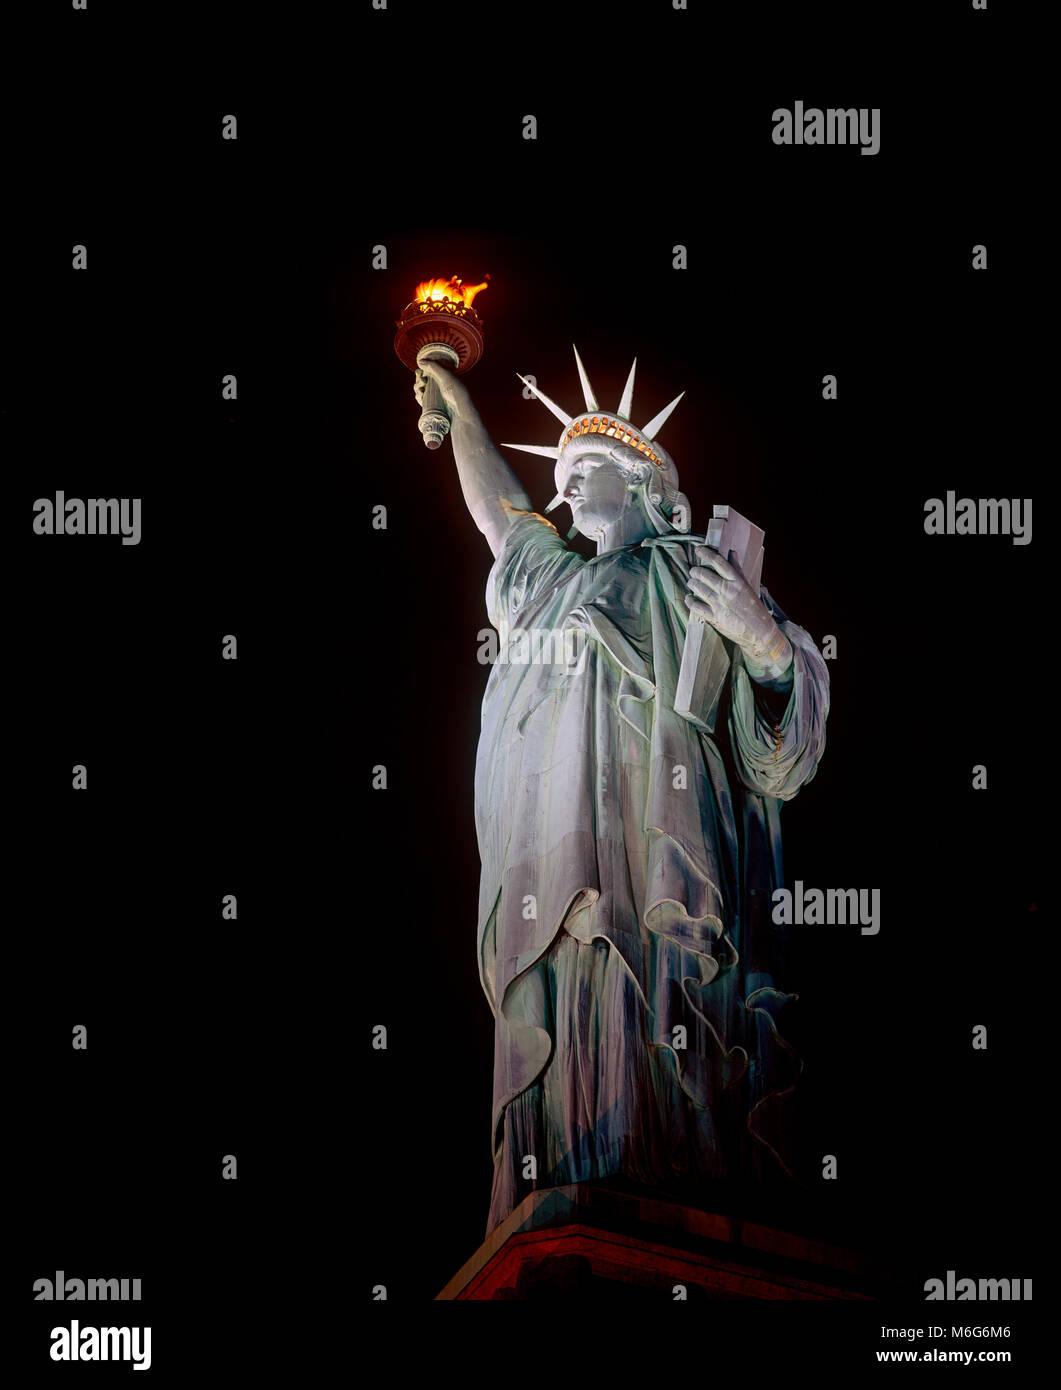 Statue of Liberty at night, New York Stock Photo